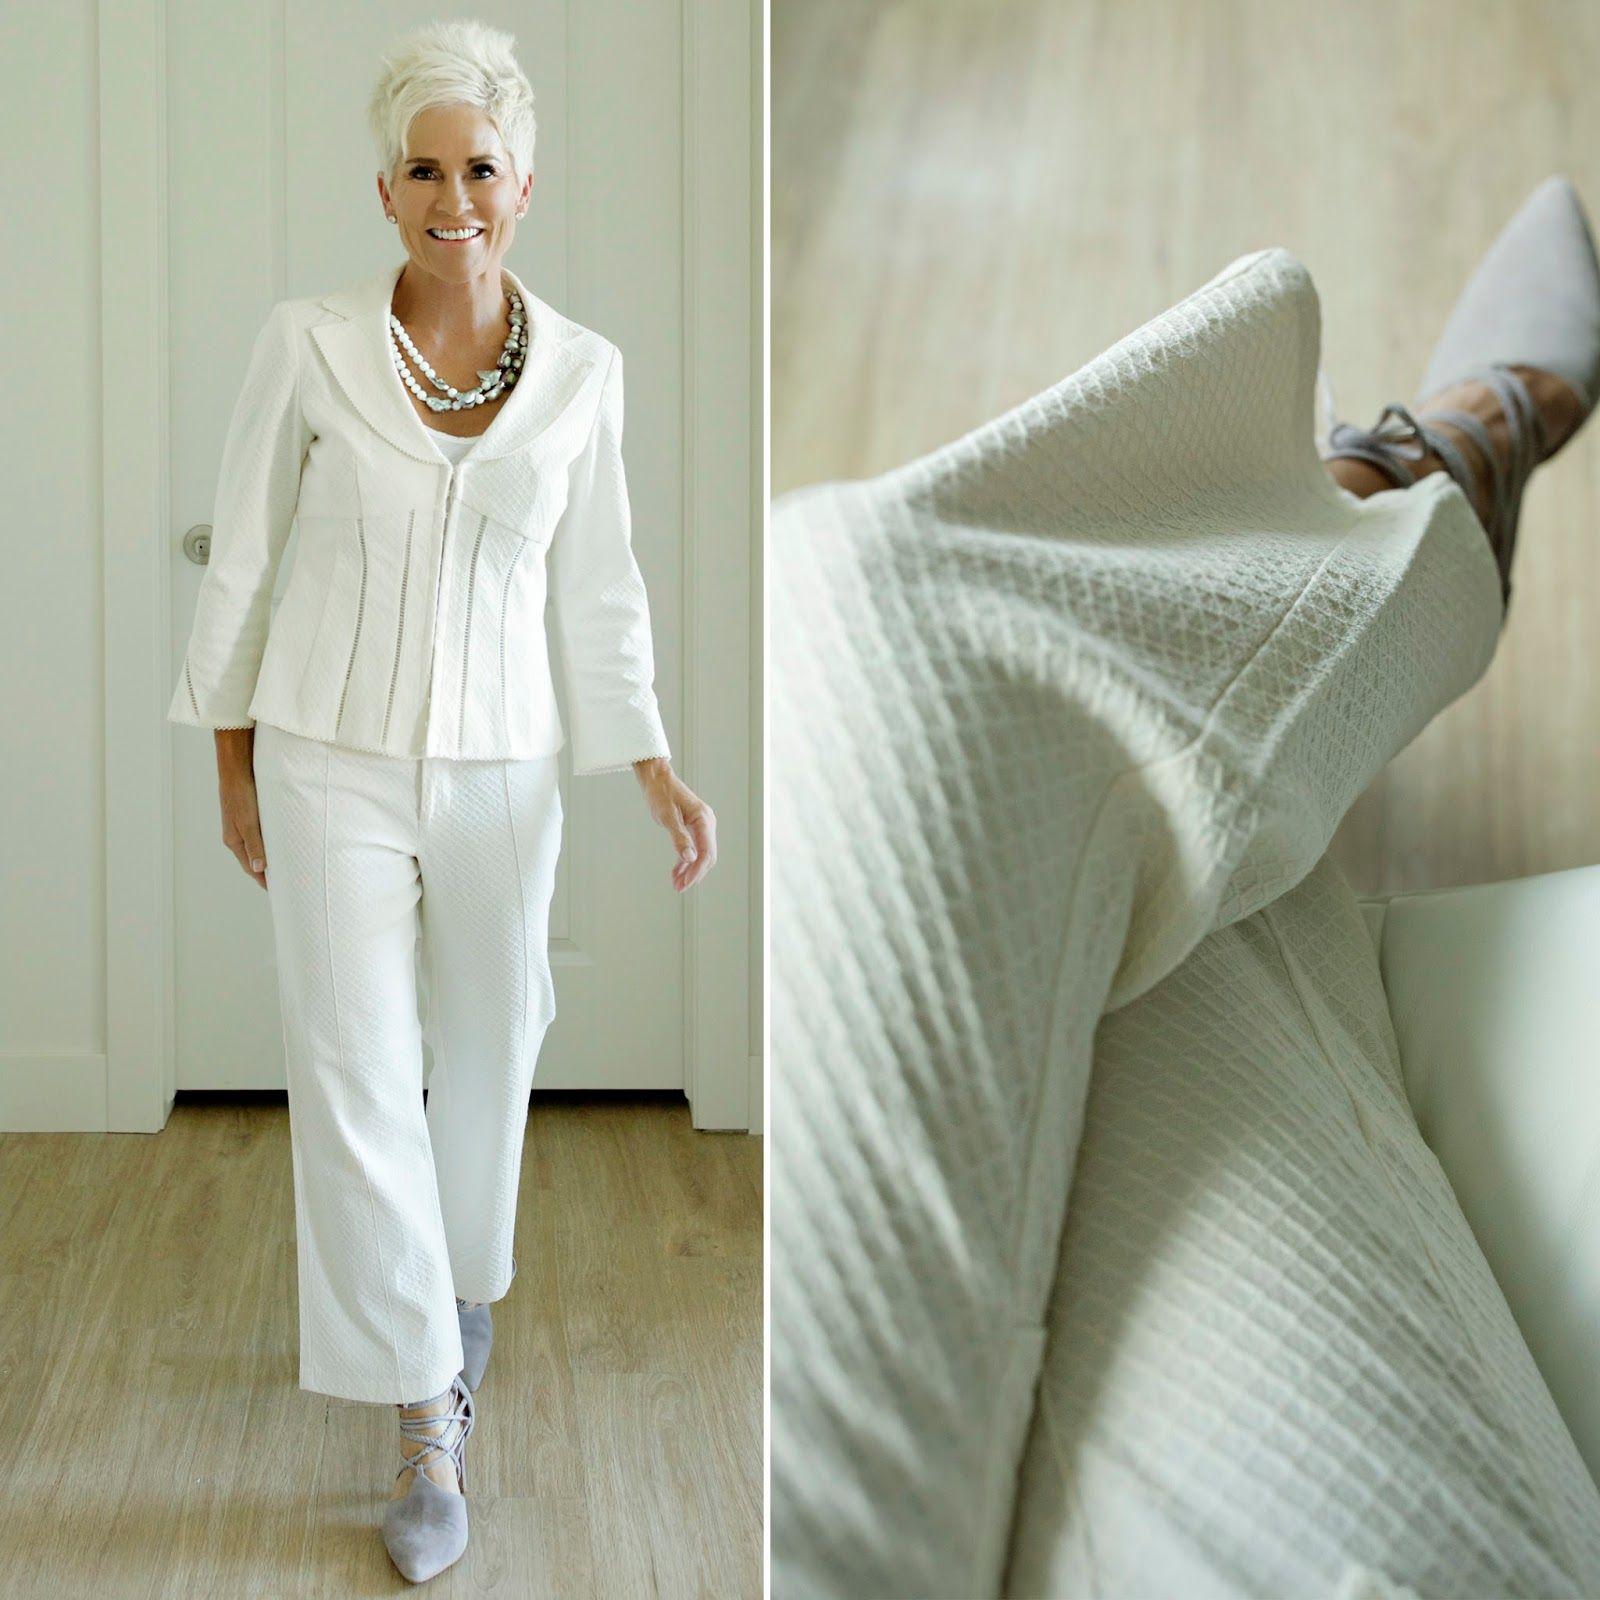 chic over 50 fashion over fifty pinterest ber 50. Black Bedroom Furniture Sets. Home Design Ideas